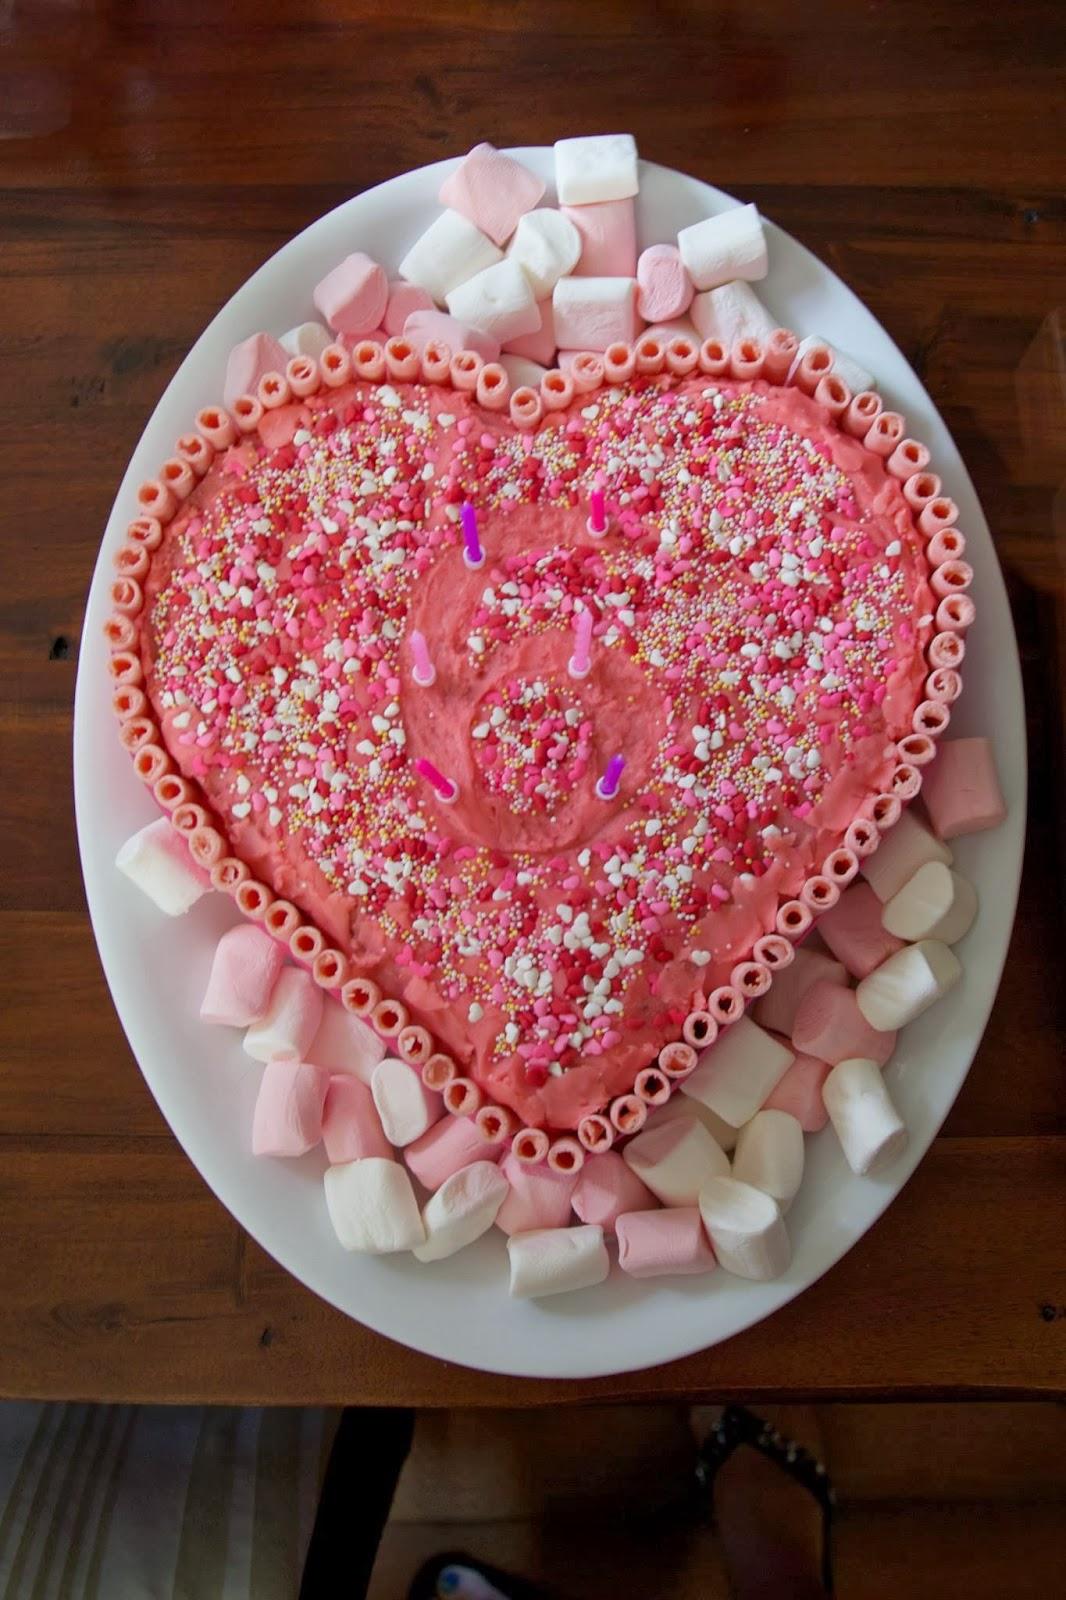 Heart Shape Bday Cake Images : Wild Yeast and Sugar Pie: Heart Shaped Birthday Cake